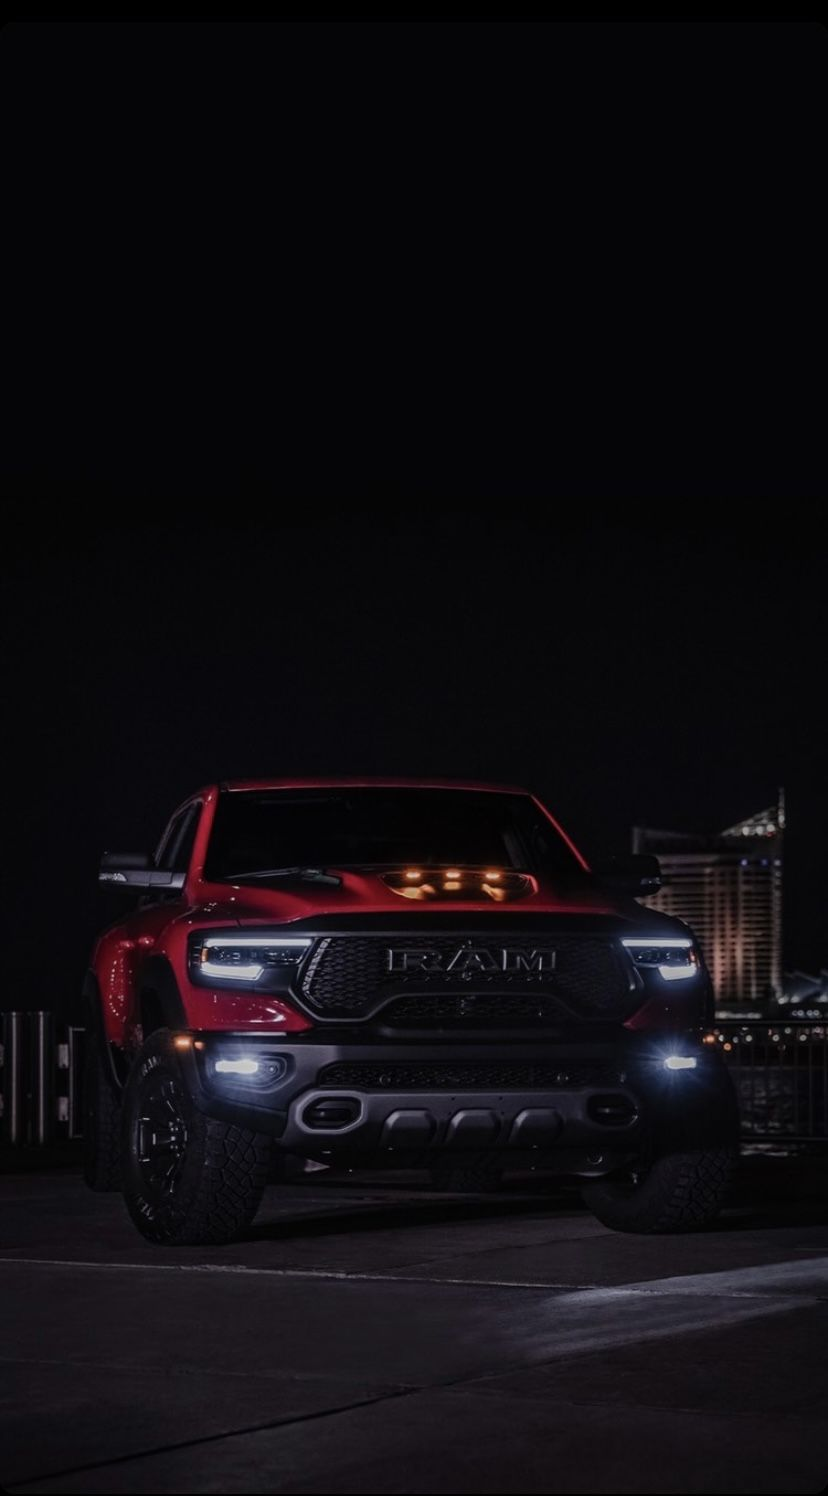 Pin By Ahmed Shehata On Cars In 2021 Ram Trucks 1500 Ram Trucks Cars Trucks